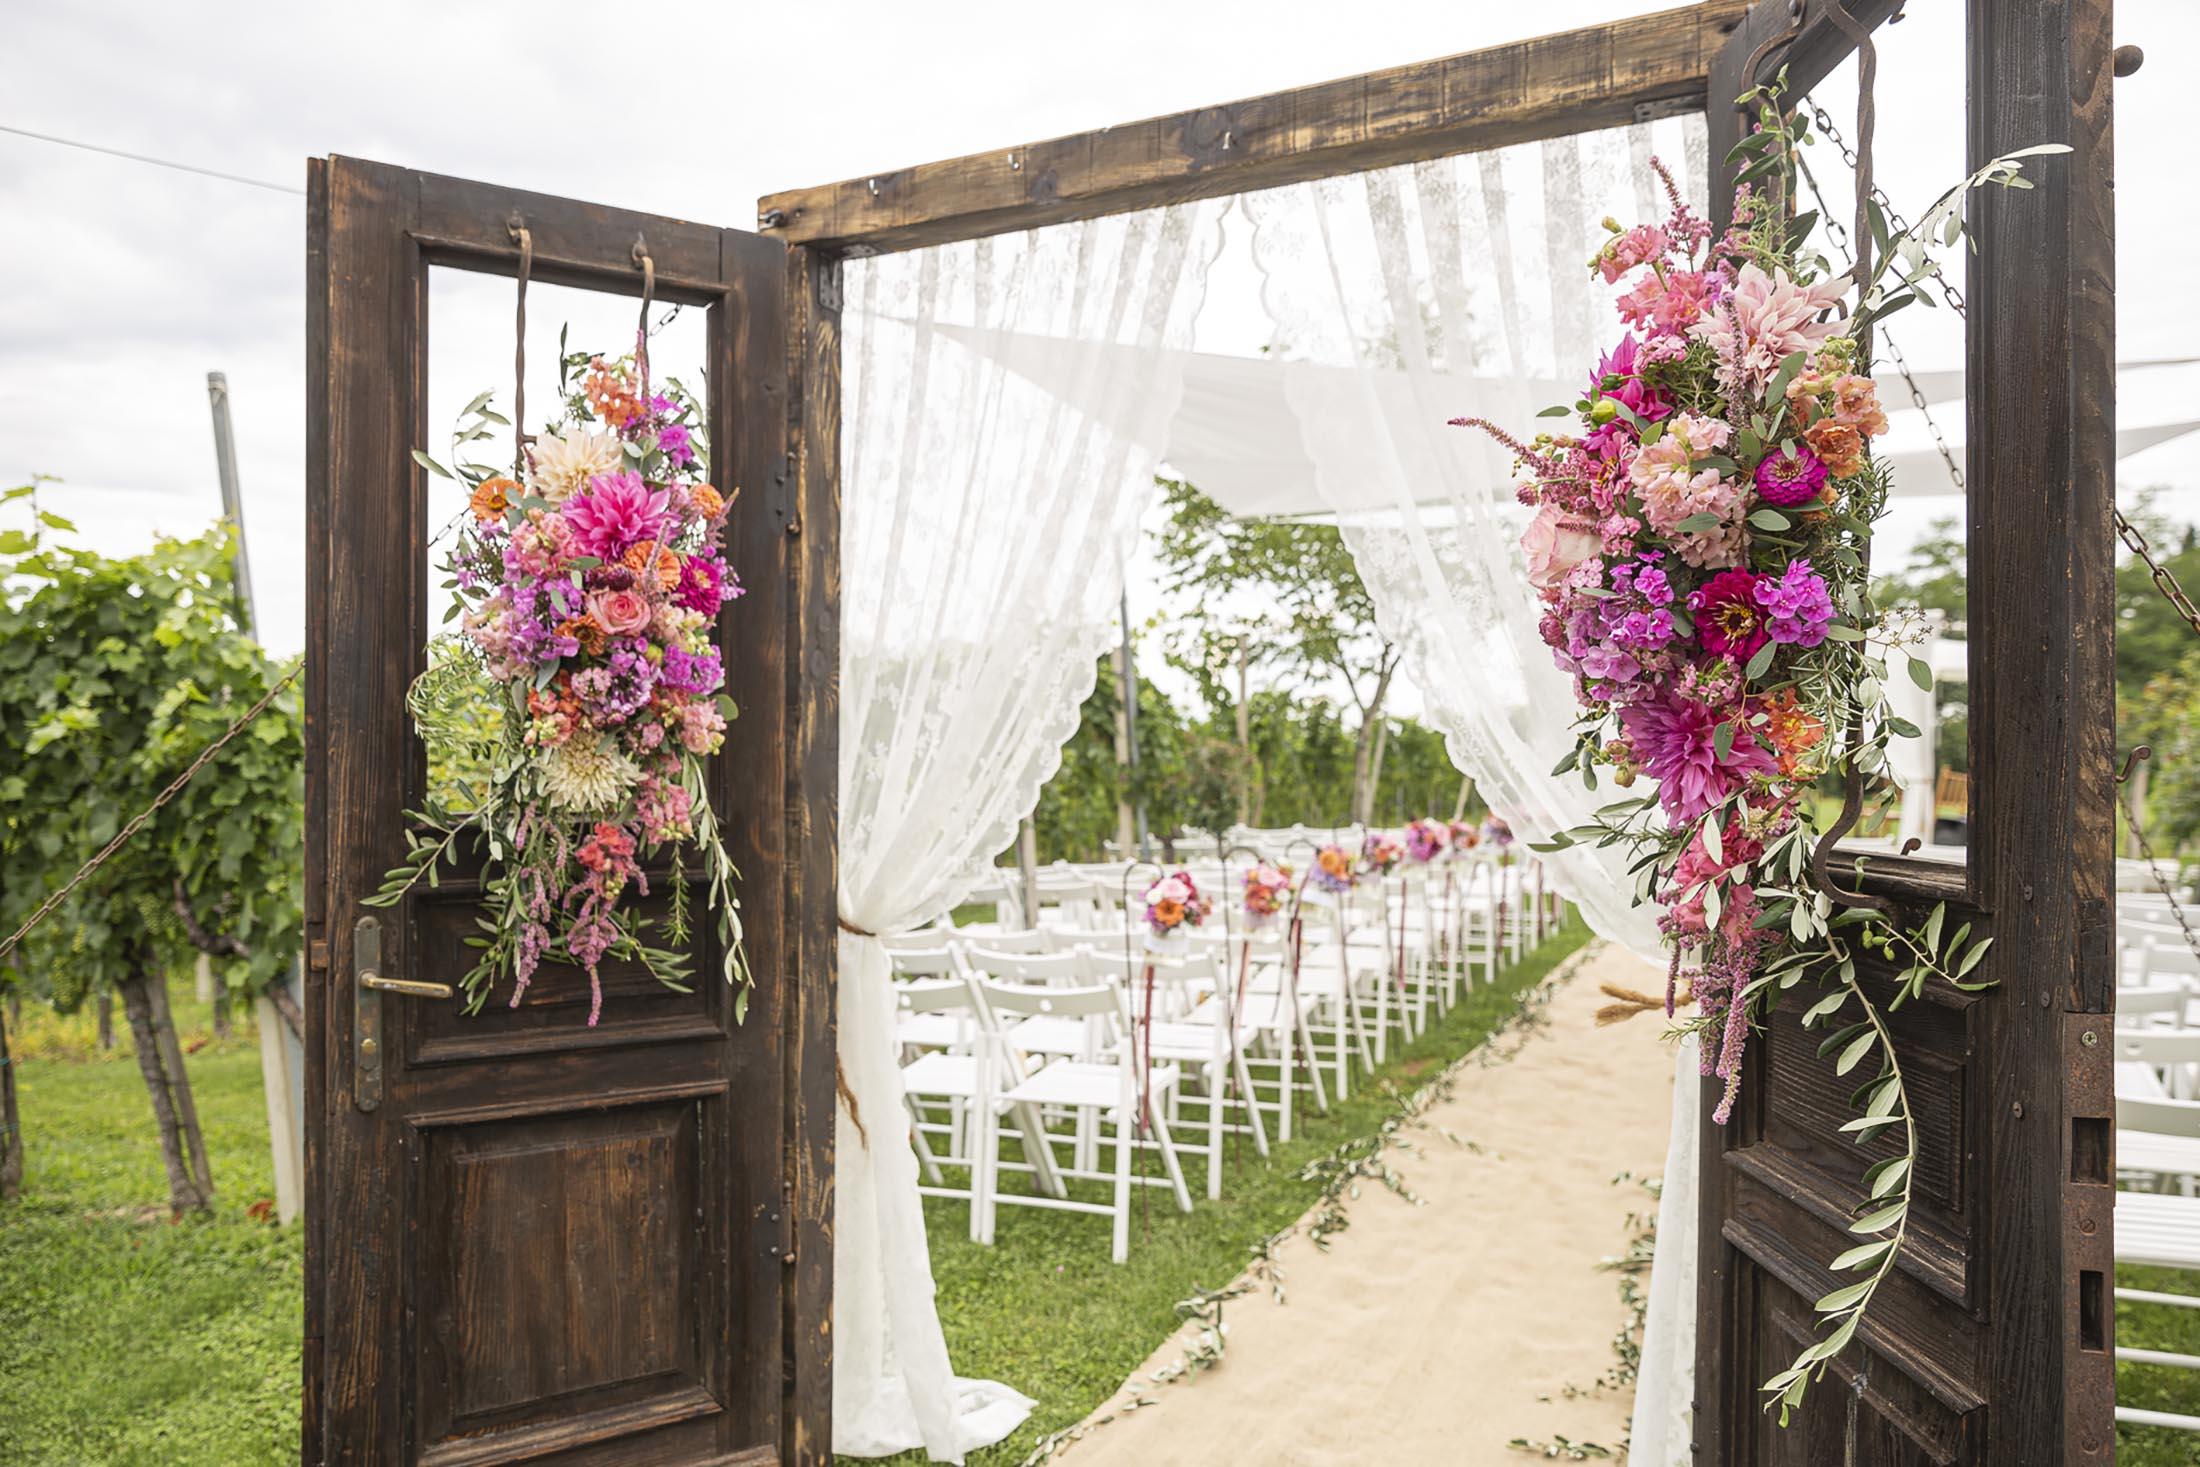 Hochzeitsfloristik | Floristik Obendrauf